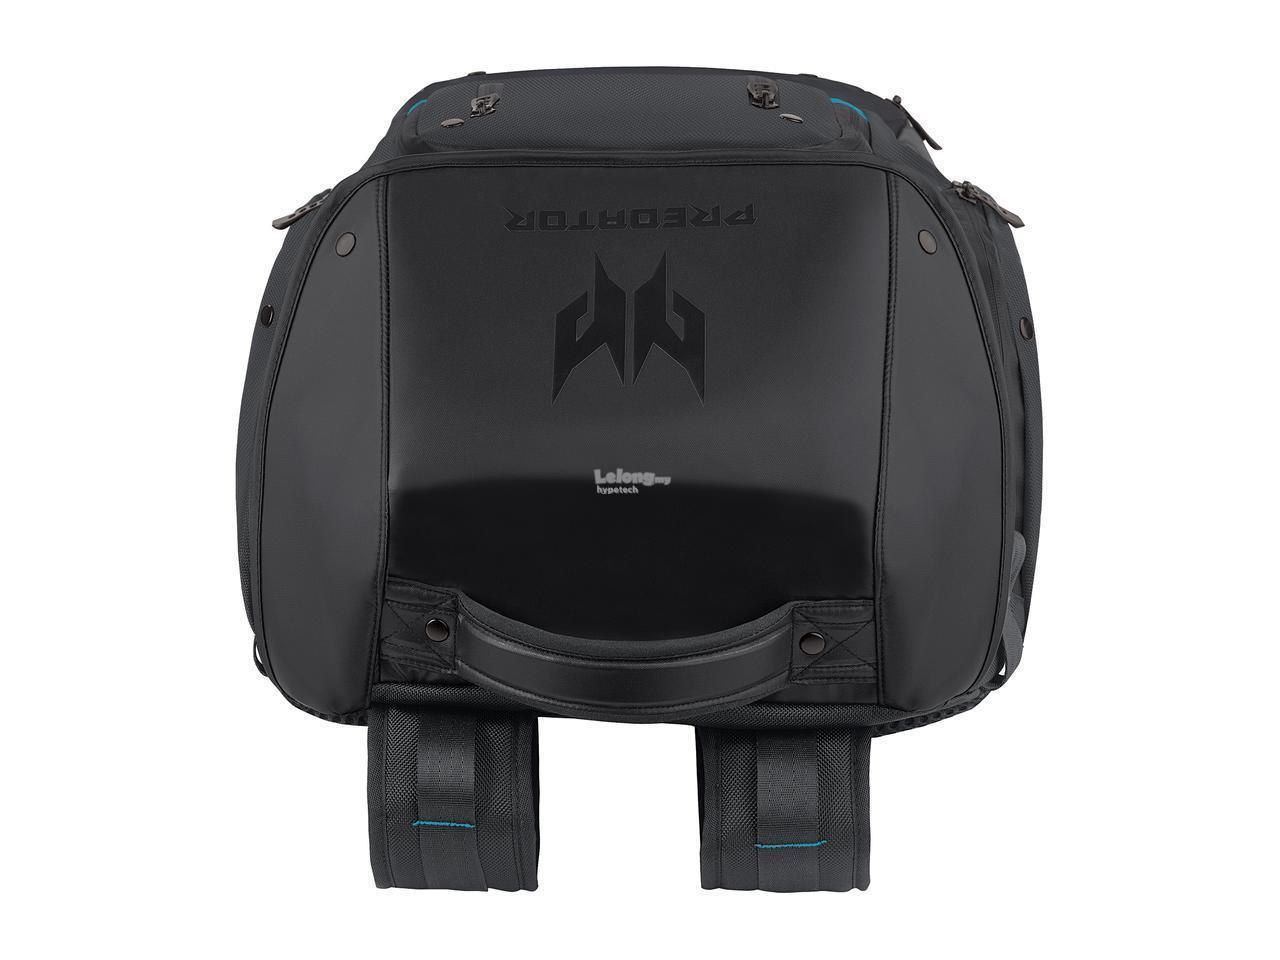 Acer Predator Notebook Gaming Utility End 7 4 2019 515 Pm Razer Backpack Black Teal